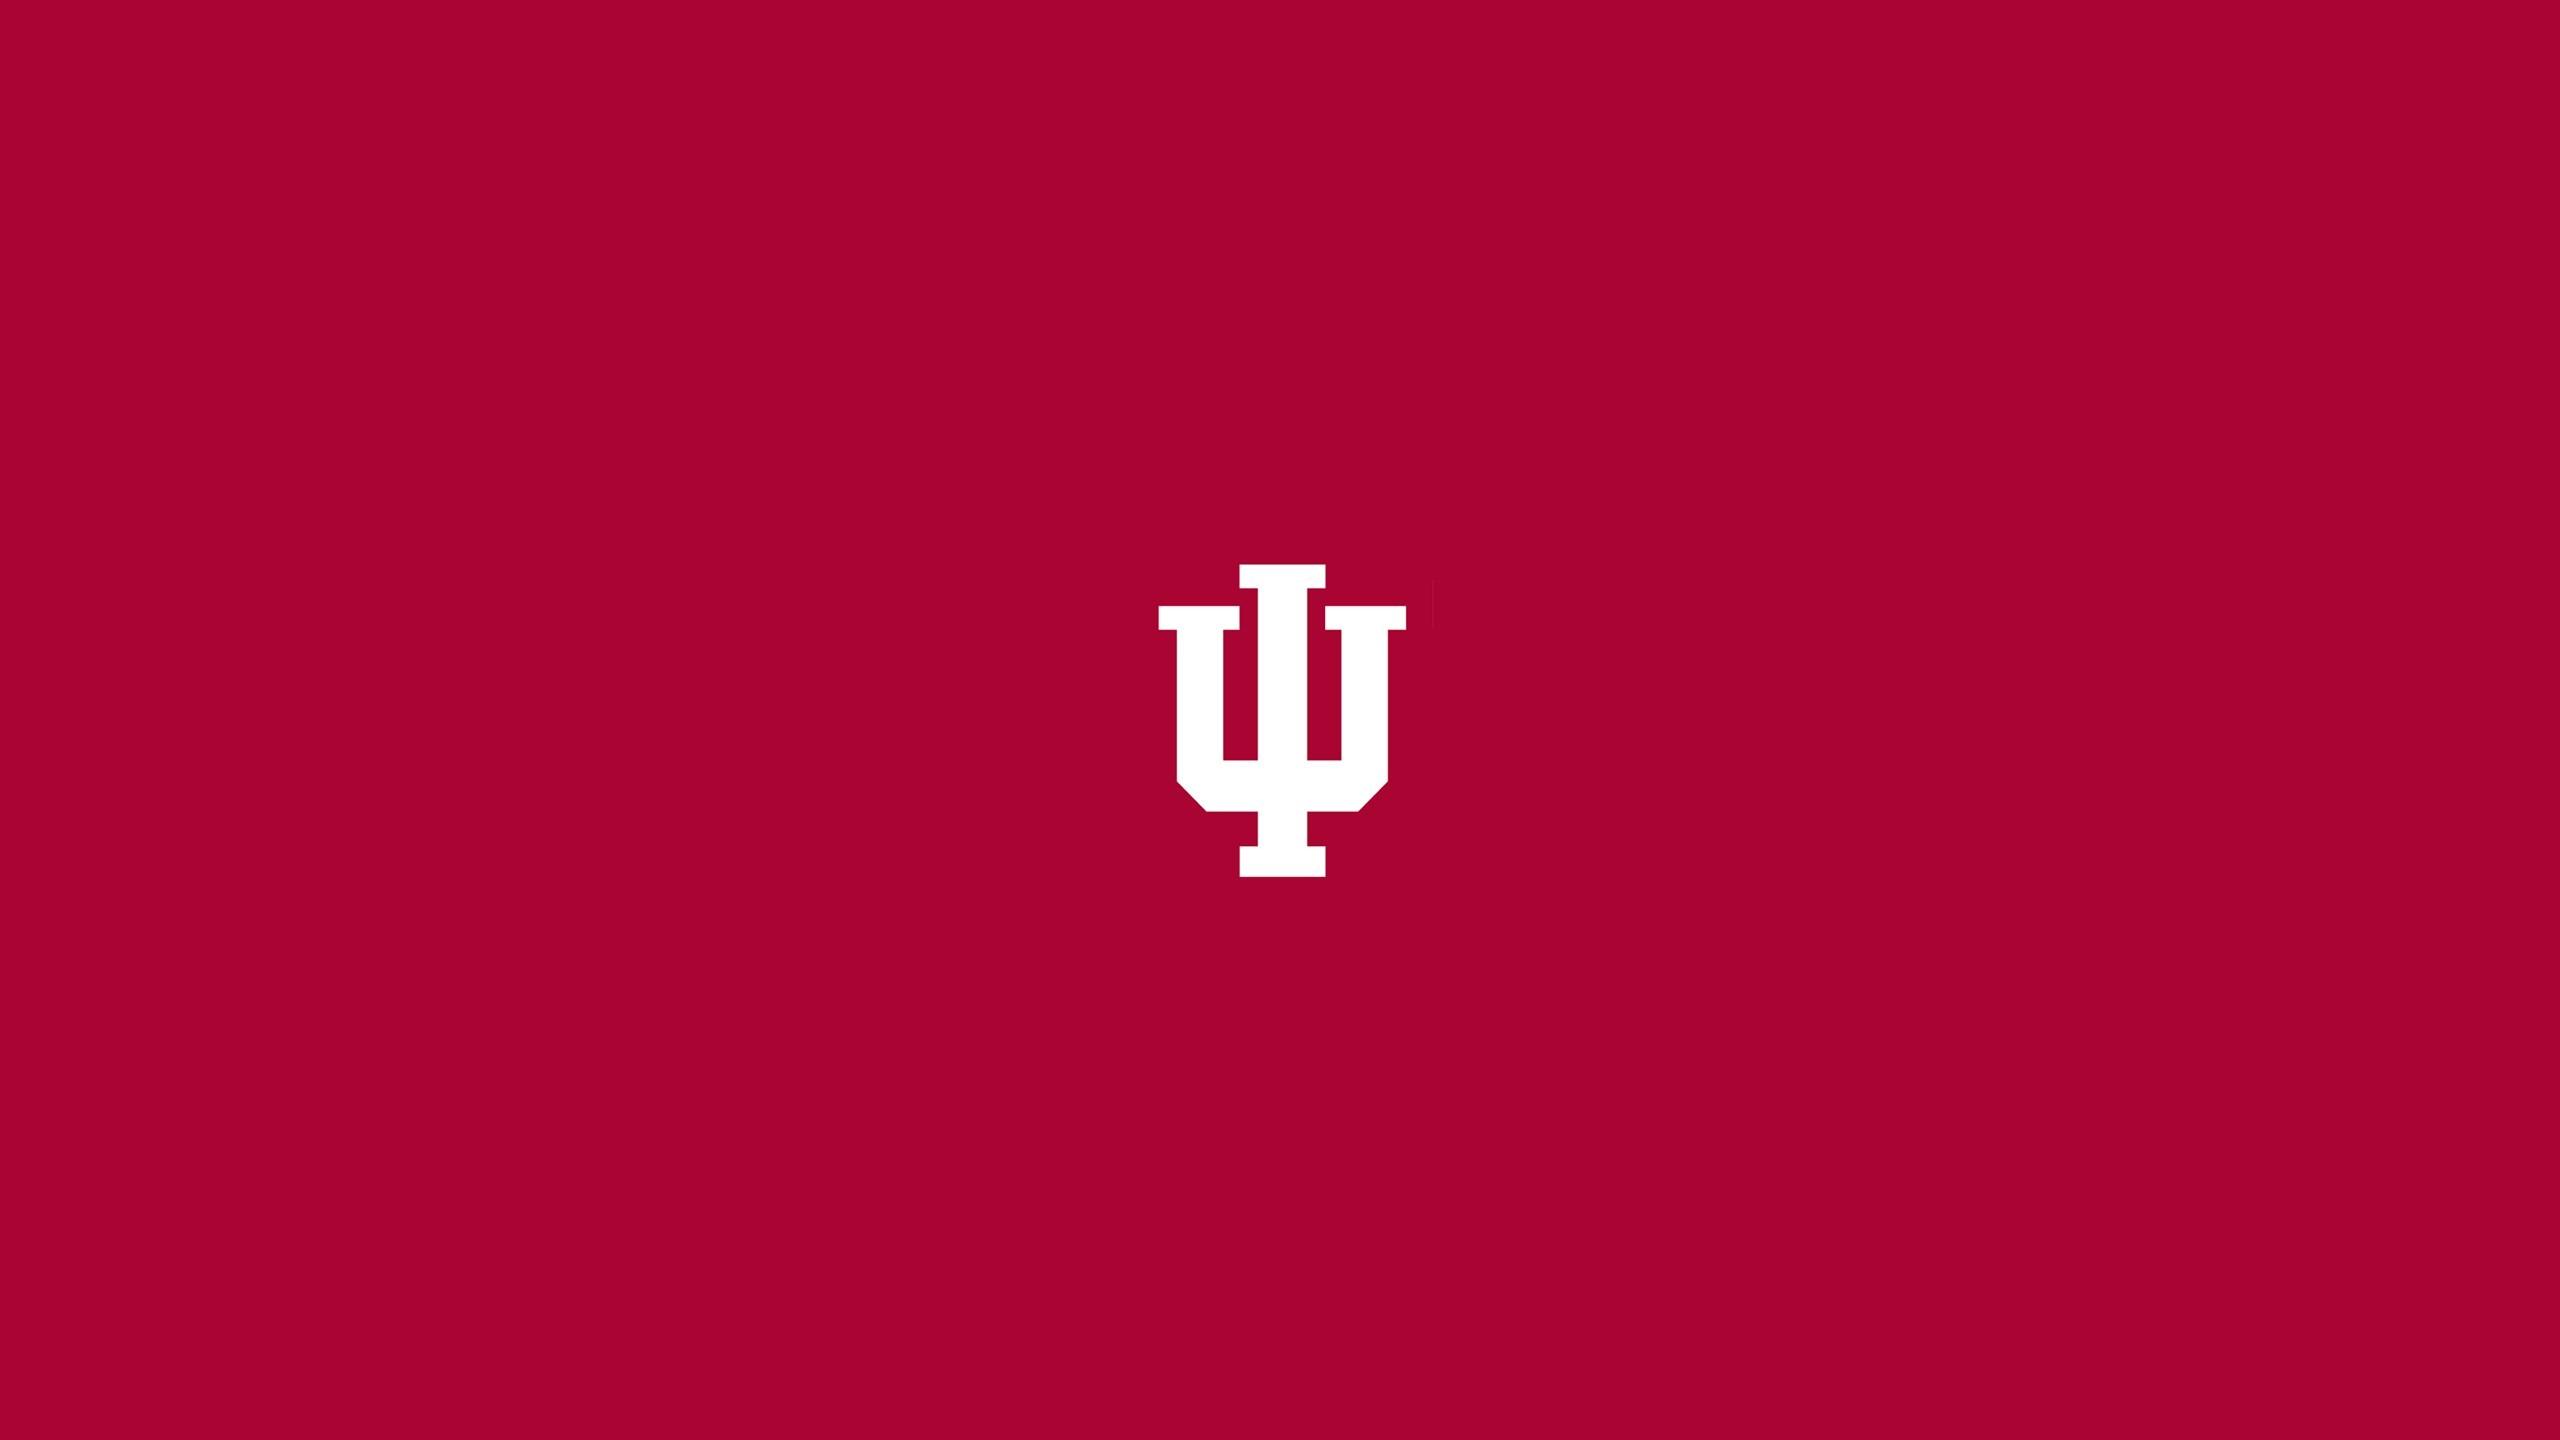 Indiana university wallpaper 65 images - Iu basketball wallpaper ...